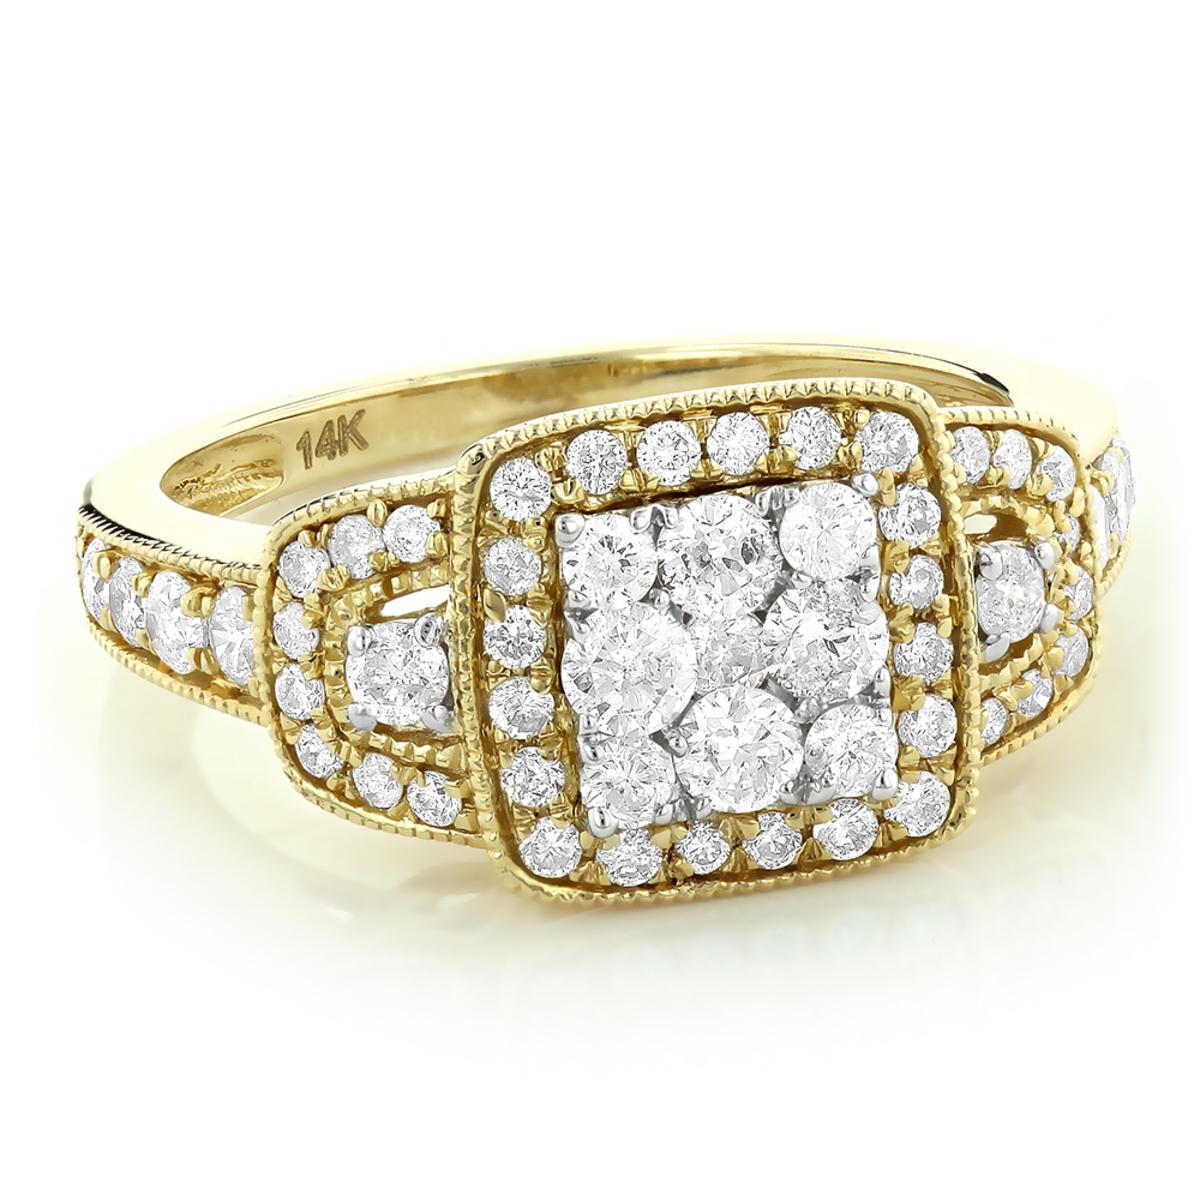 Halo Princess Cut Diamond Engagement Ring Look 1.2ct Ladies Cluster Ring